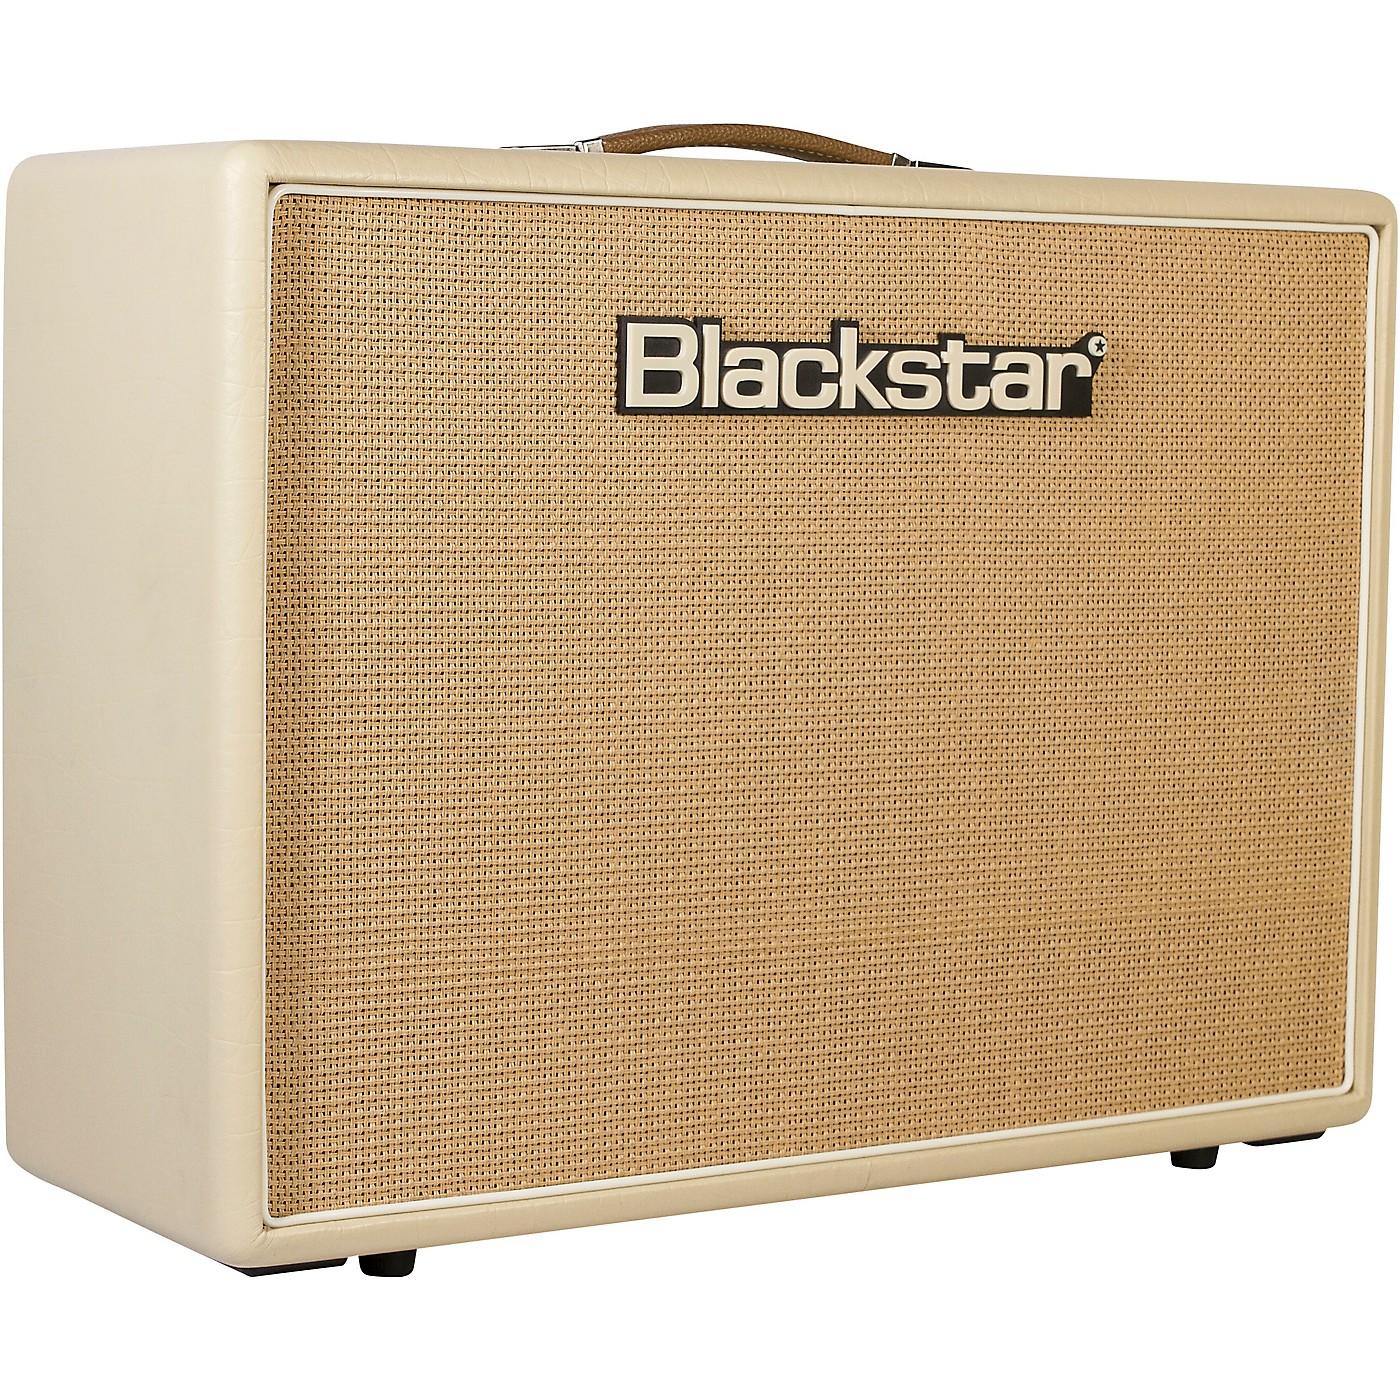 Blackstar Artist 30 Blonde Special 30W 2x12 Tube Guitar Combo Amp thumbnail